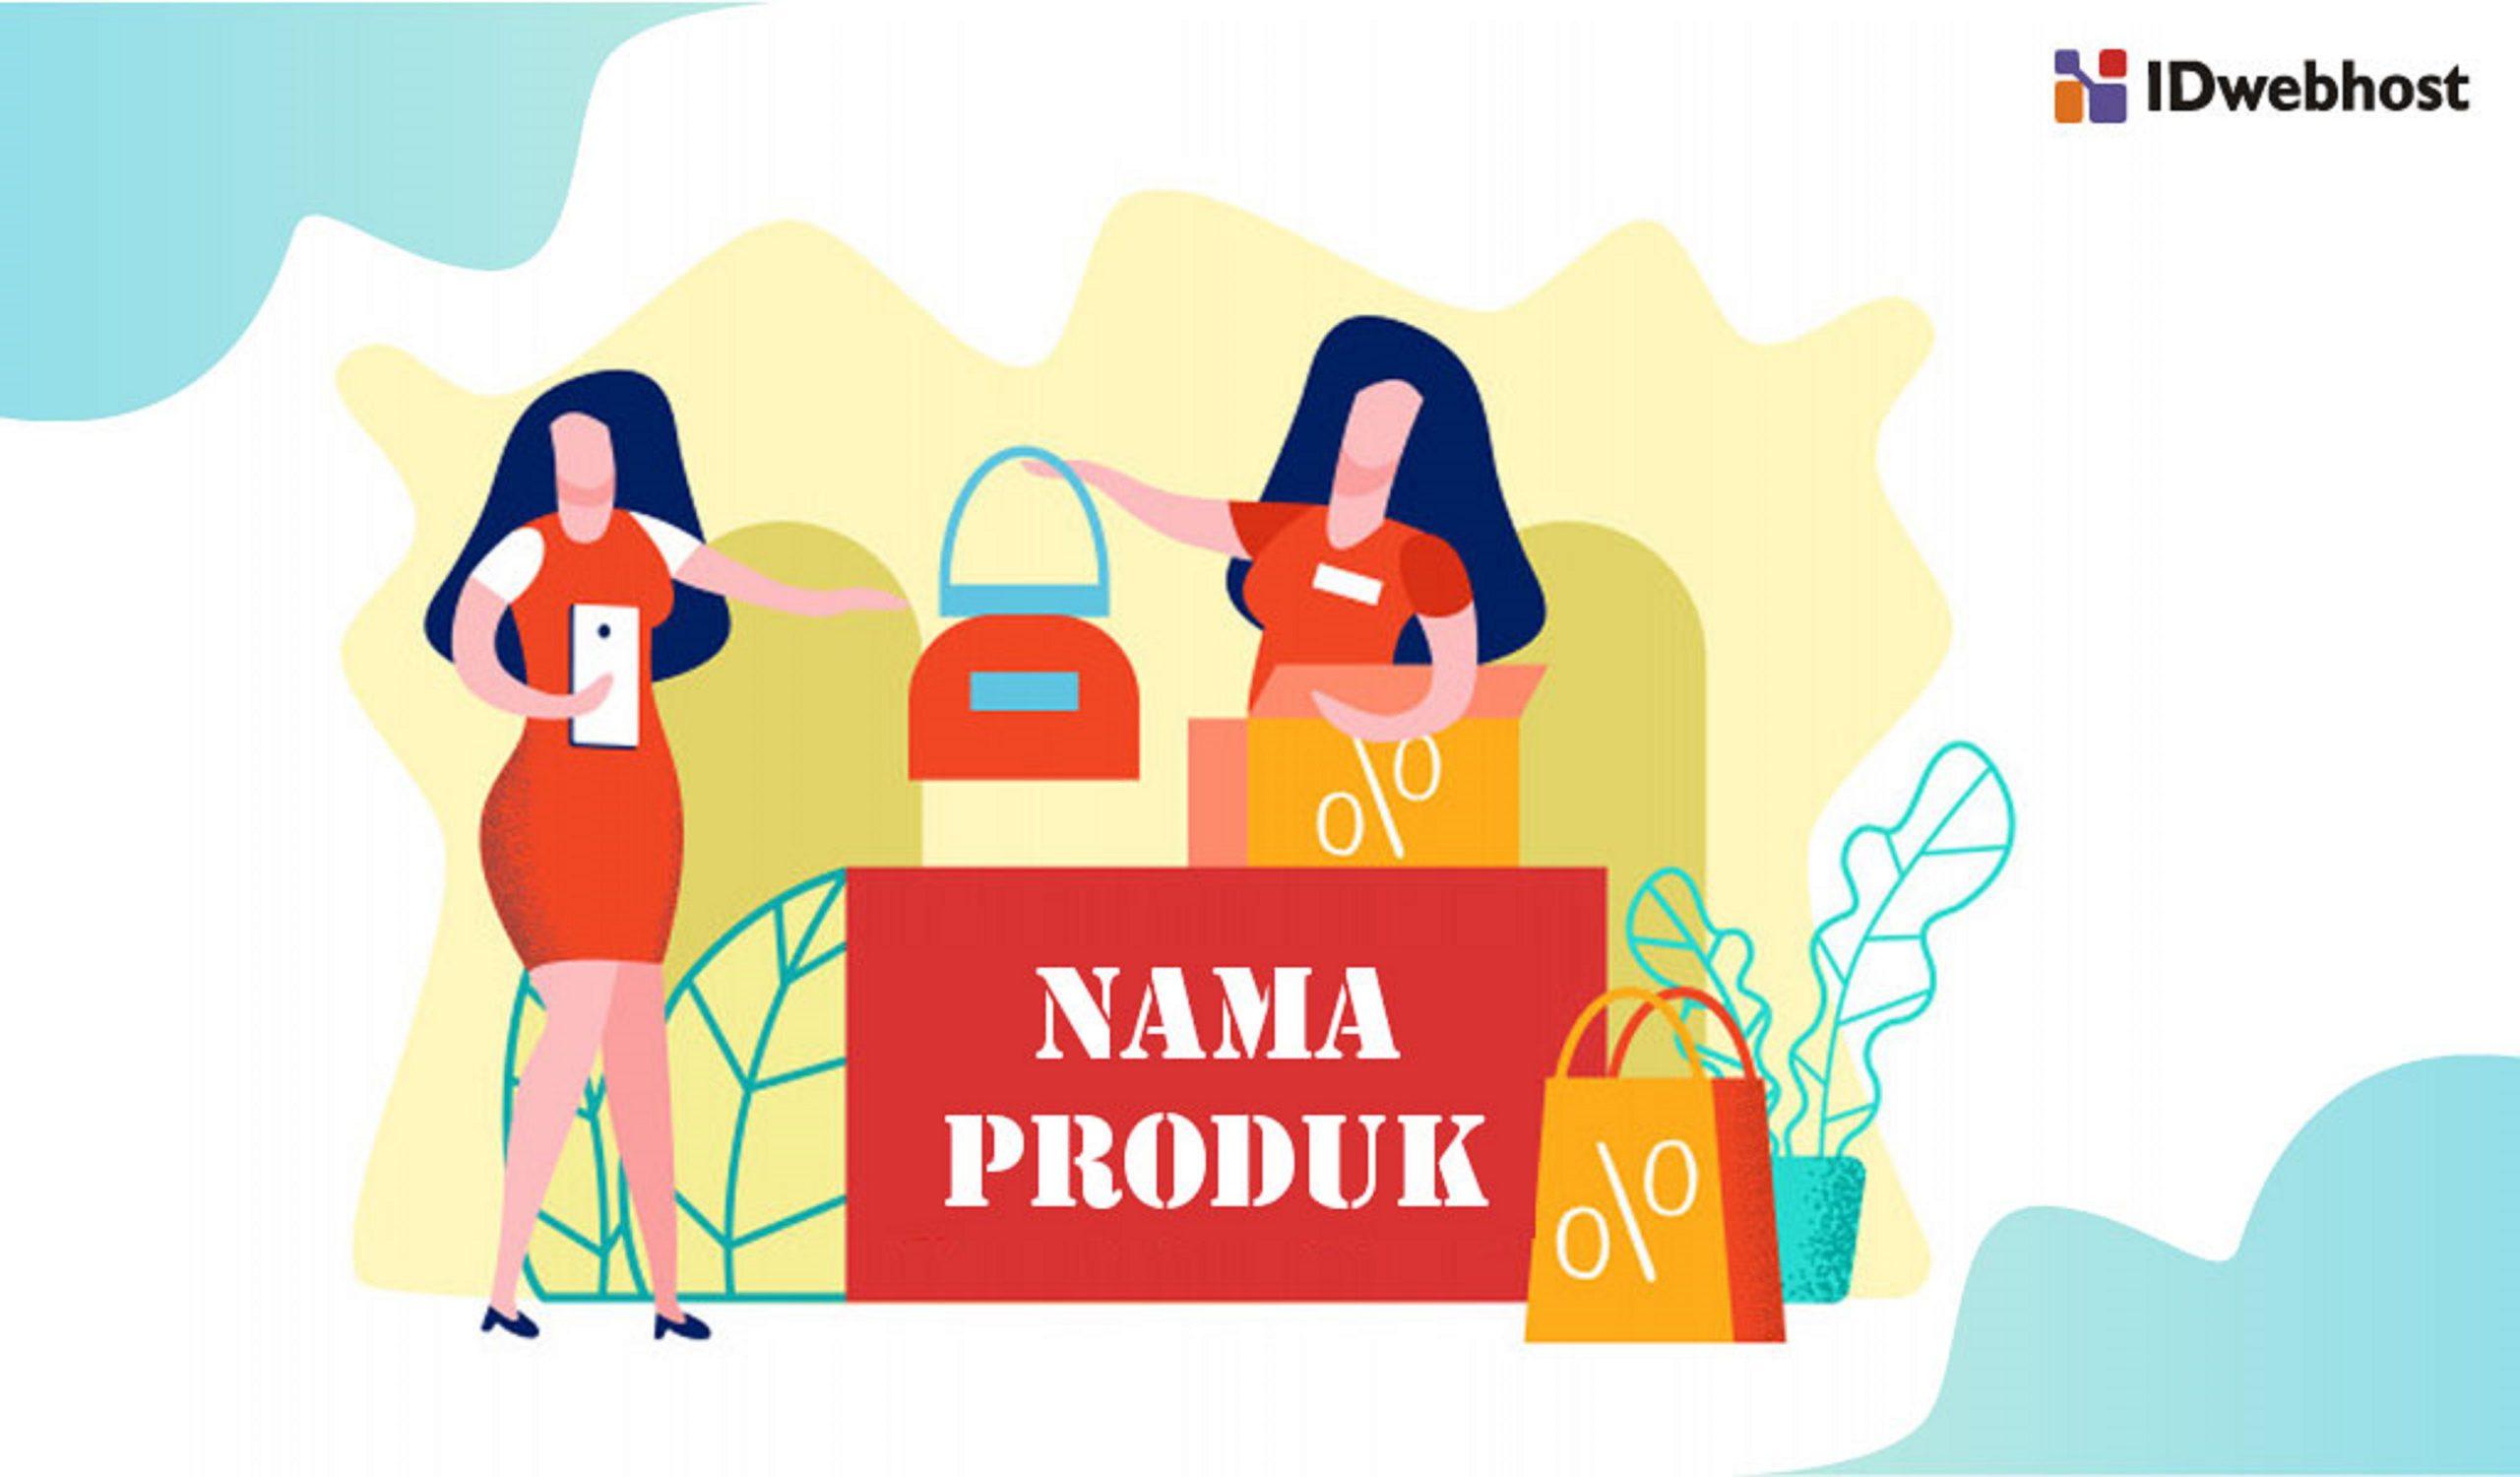 Cara Menentukan Nama Produk Yang Memikat Pasar